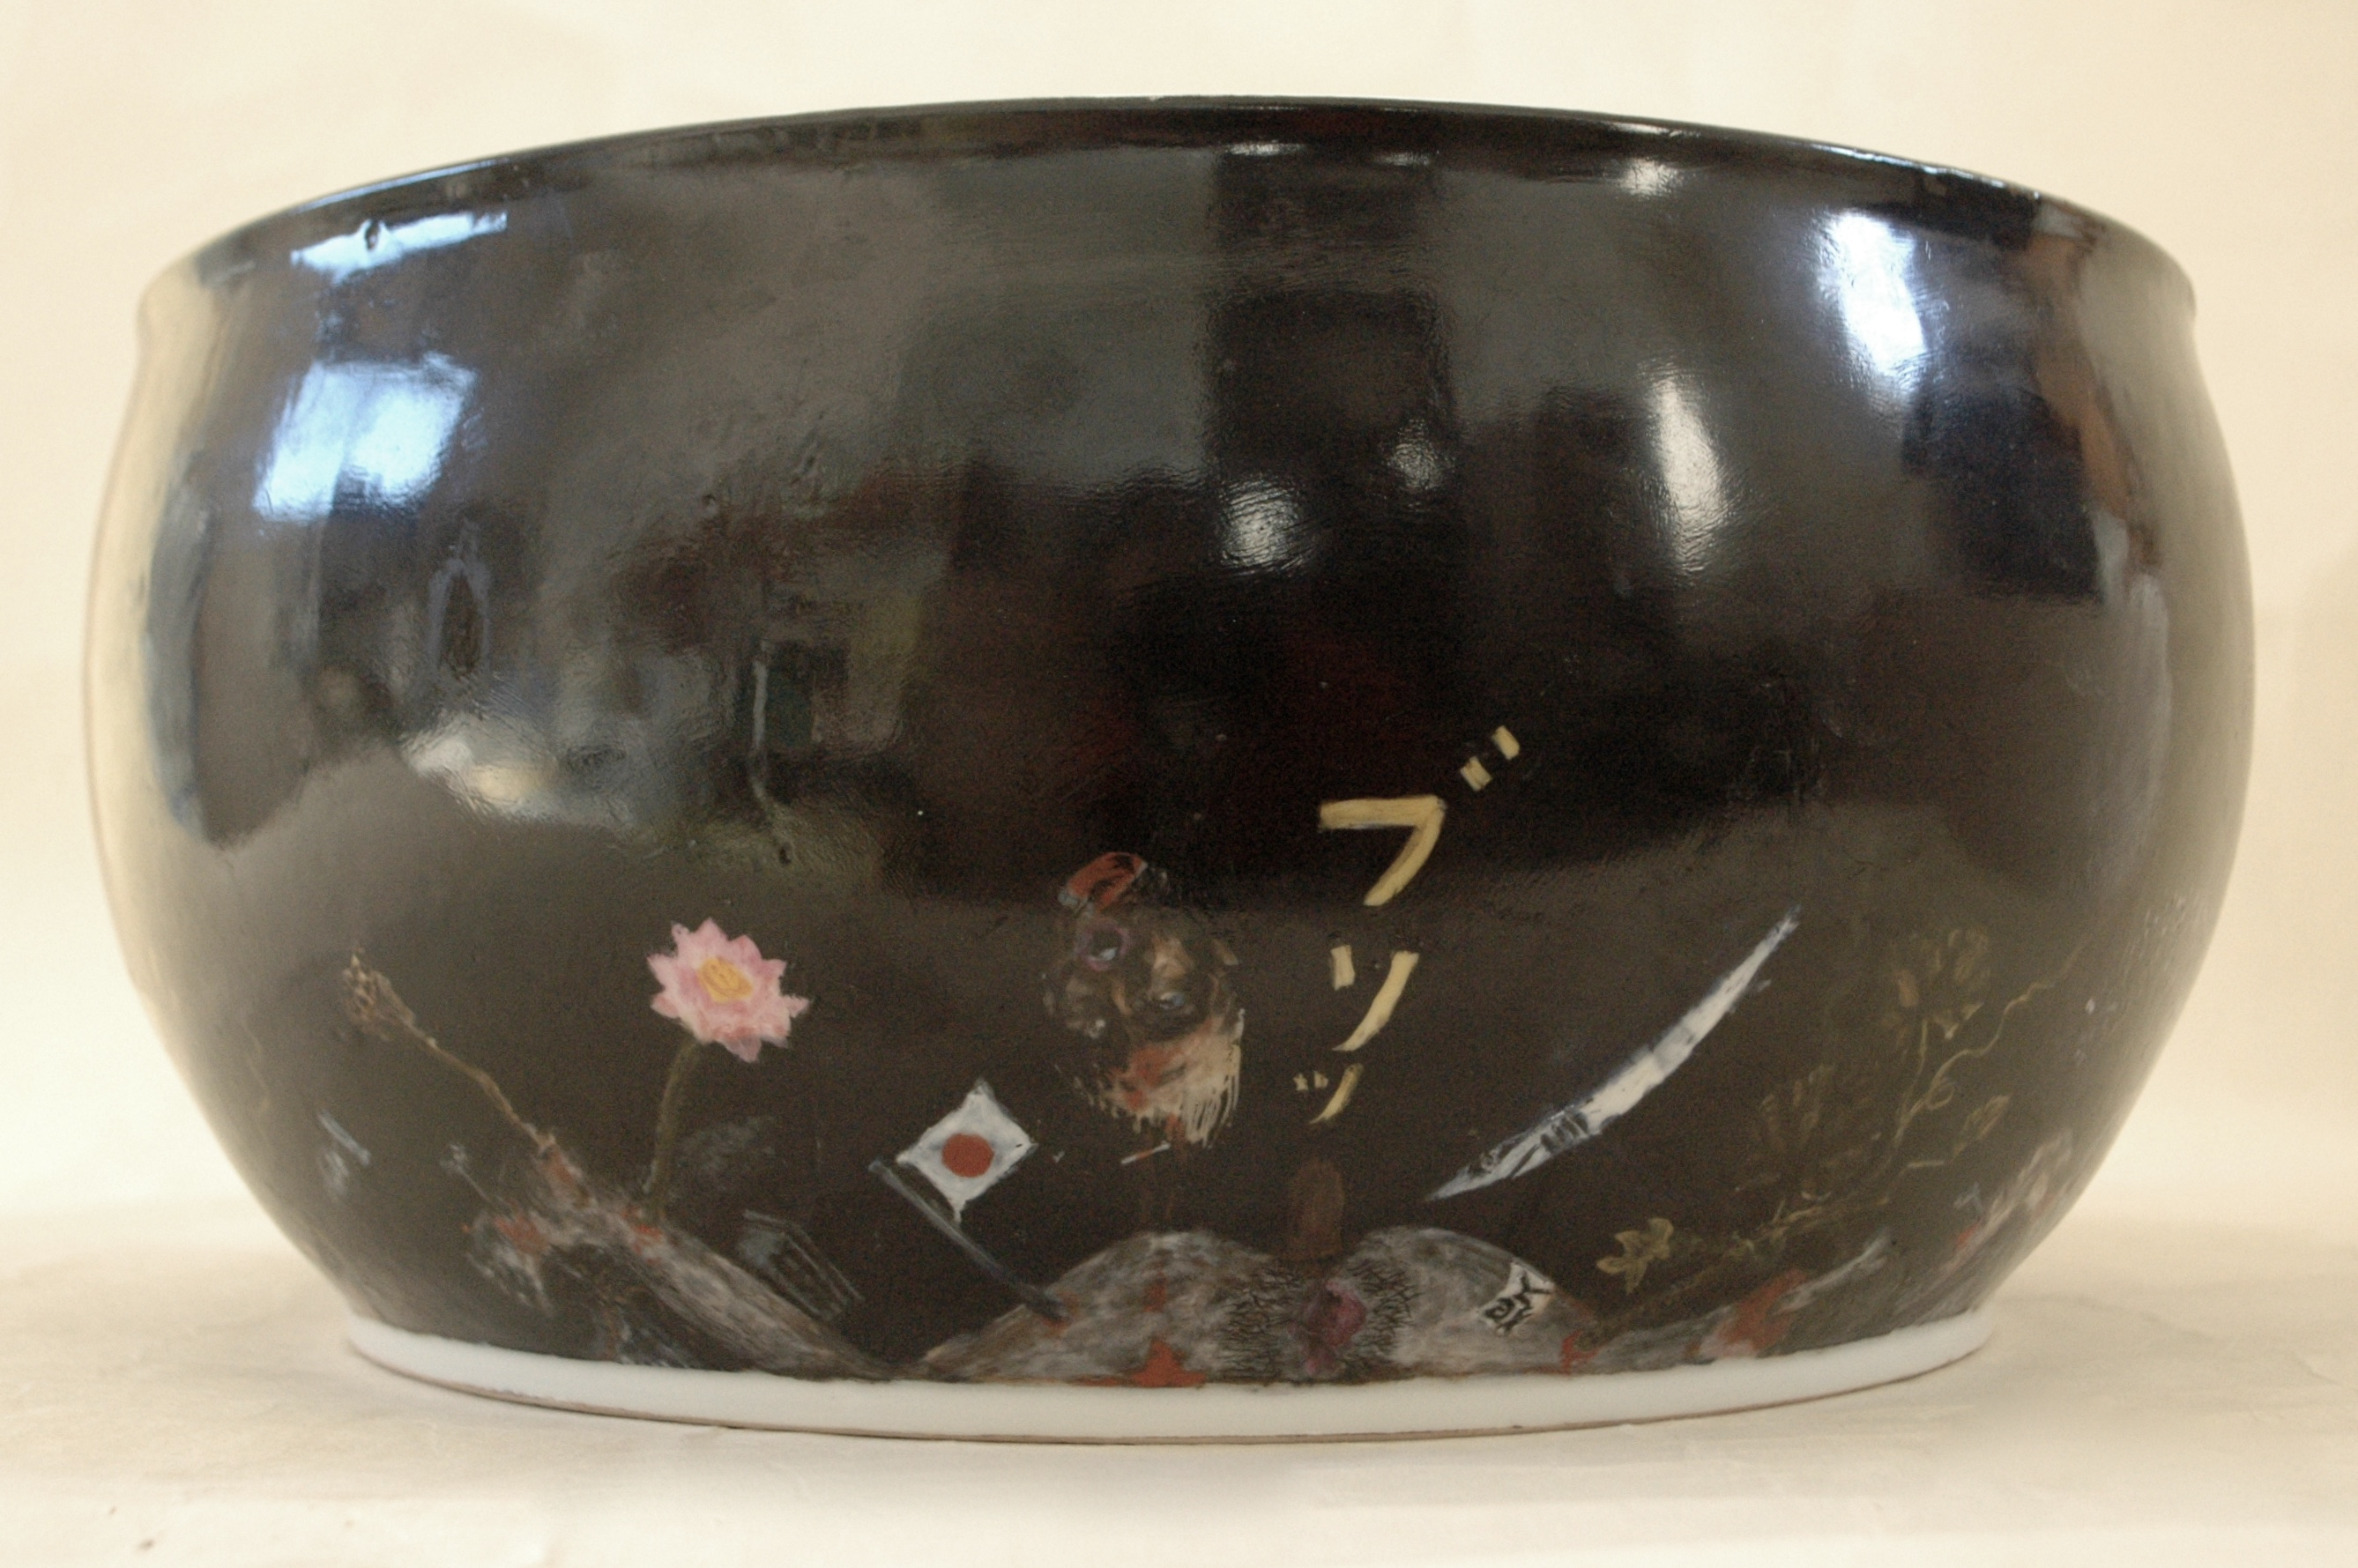 Porcelain painting 色絵大鉢「ケツの穴」側面